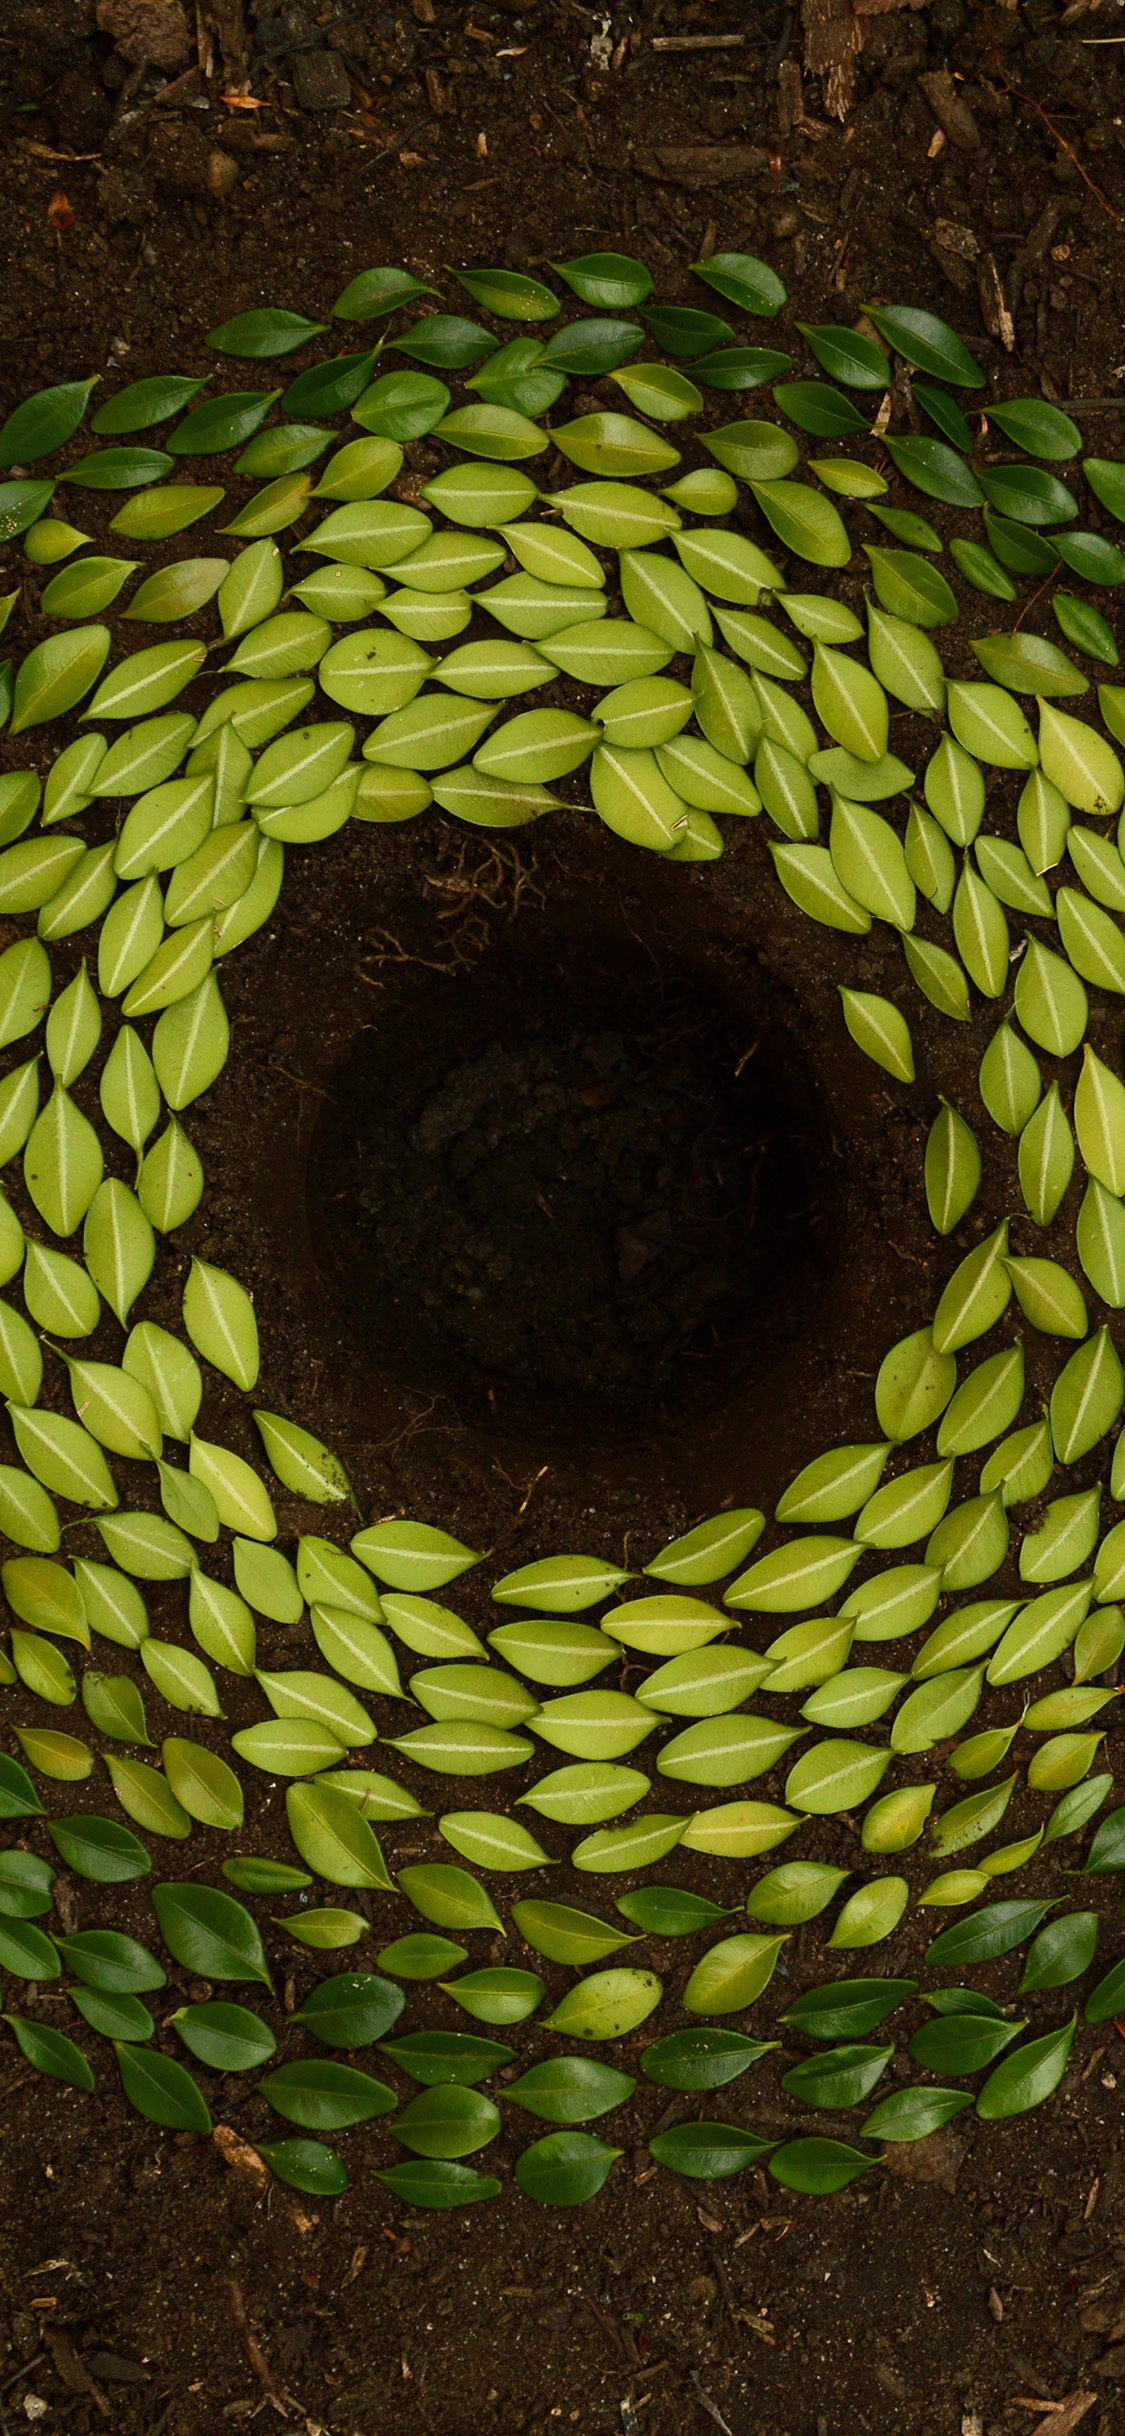 iPhonexpapers.com-Apple-iPhone-wallpaper-nz96-leaf-art-land-green-nature-flower